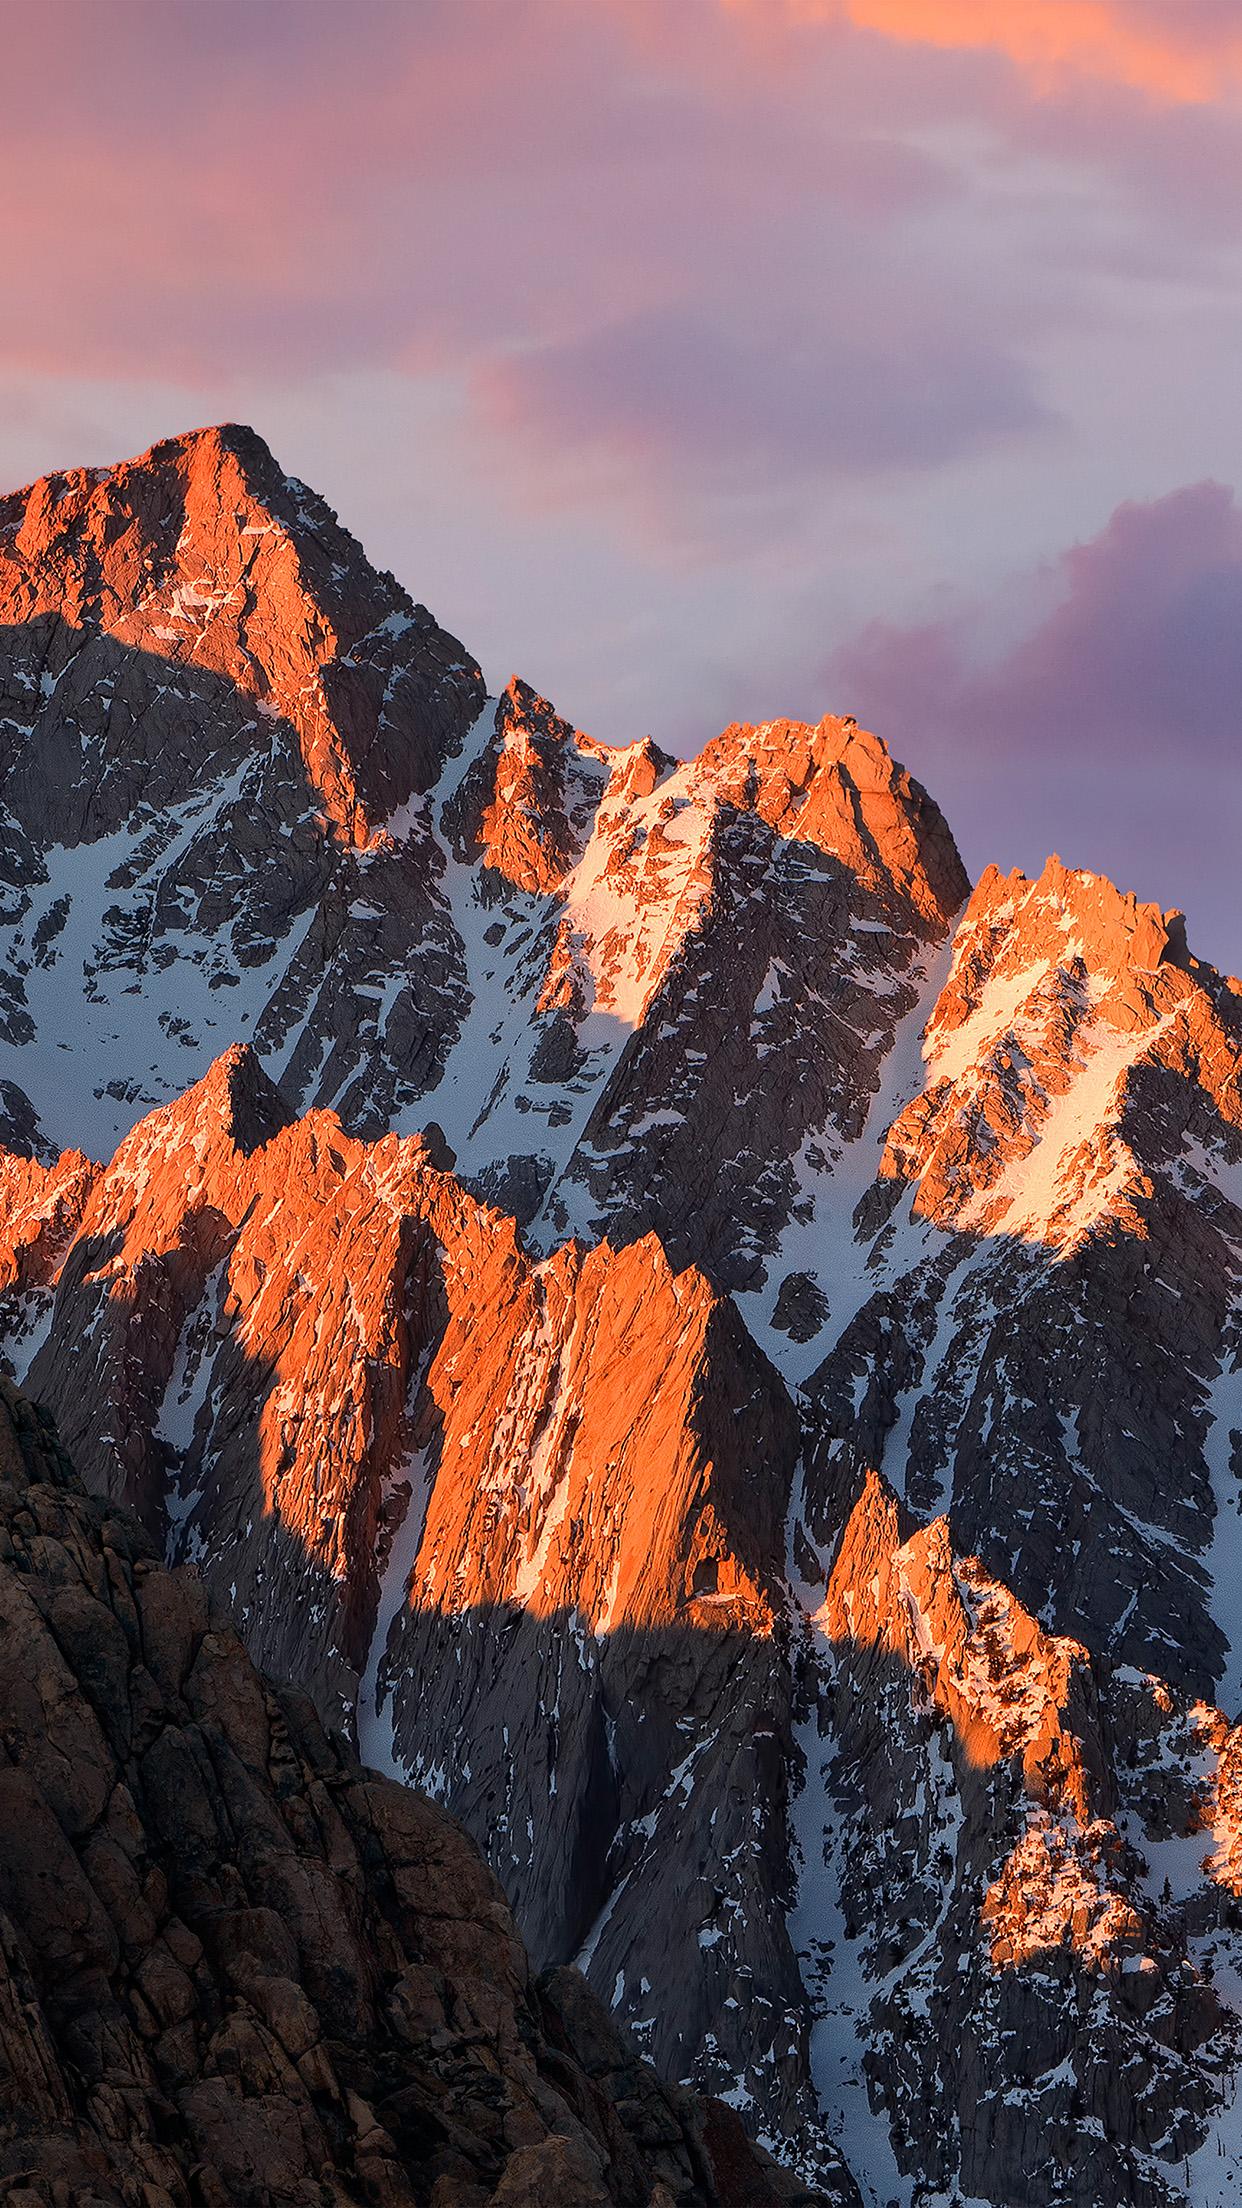 Mac Os X Yosemite Wallpaper Iphone 6 Ar65 Apple Macos Sierra Mountain Wwdc Official Wallpaper